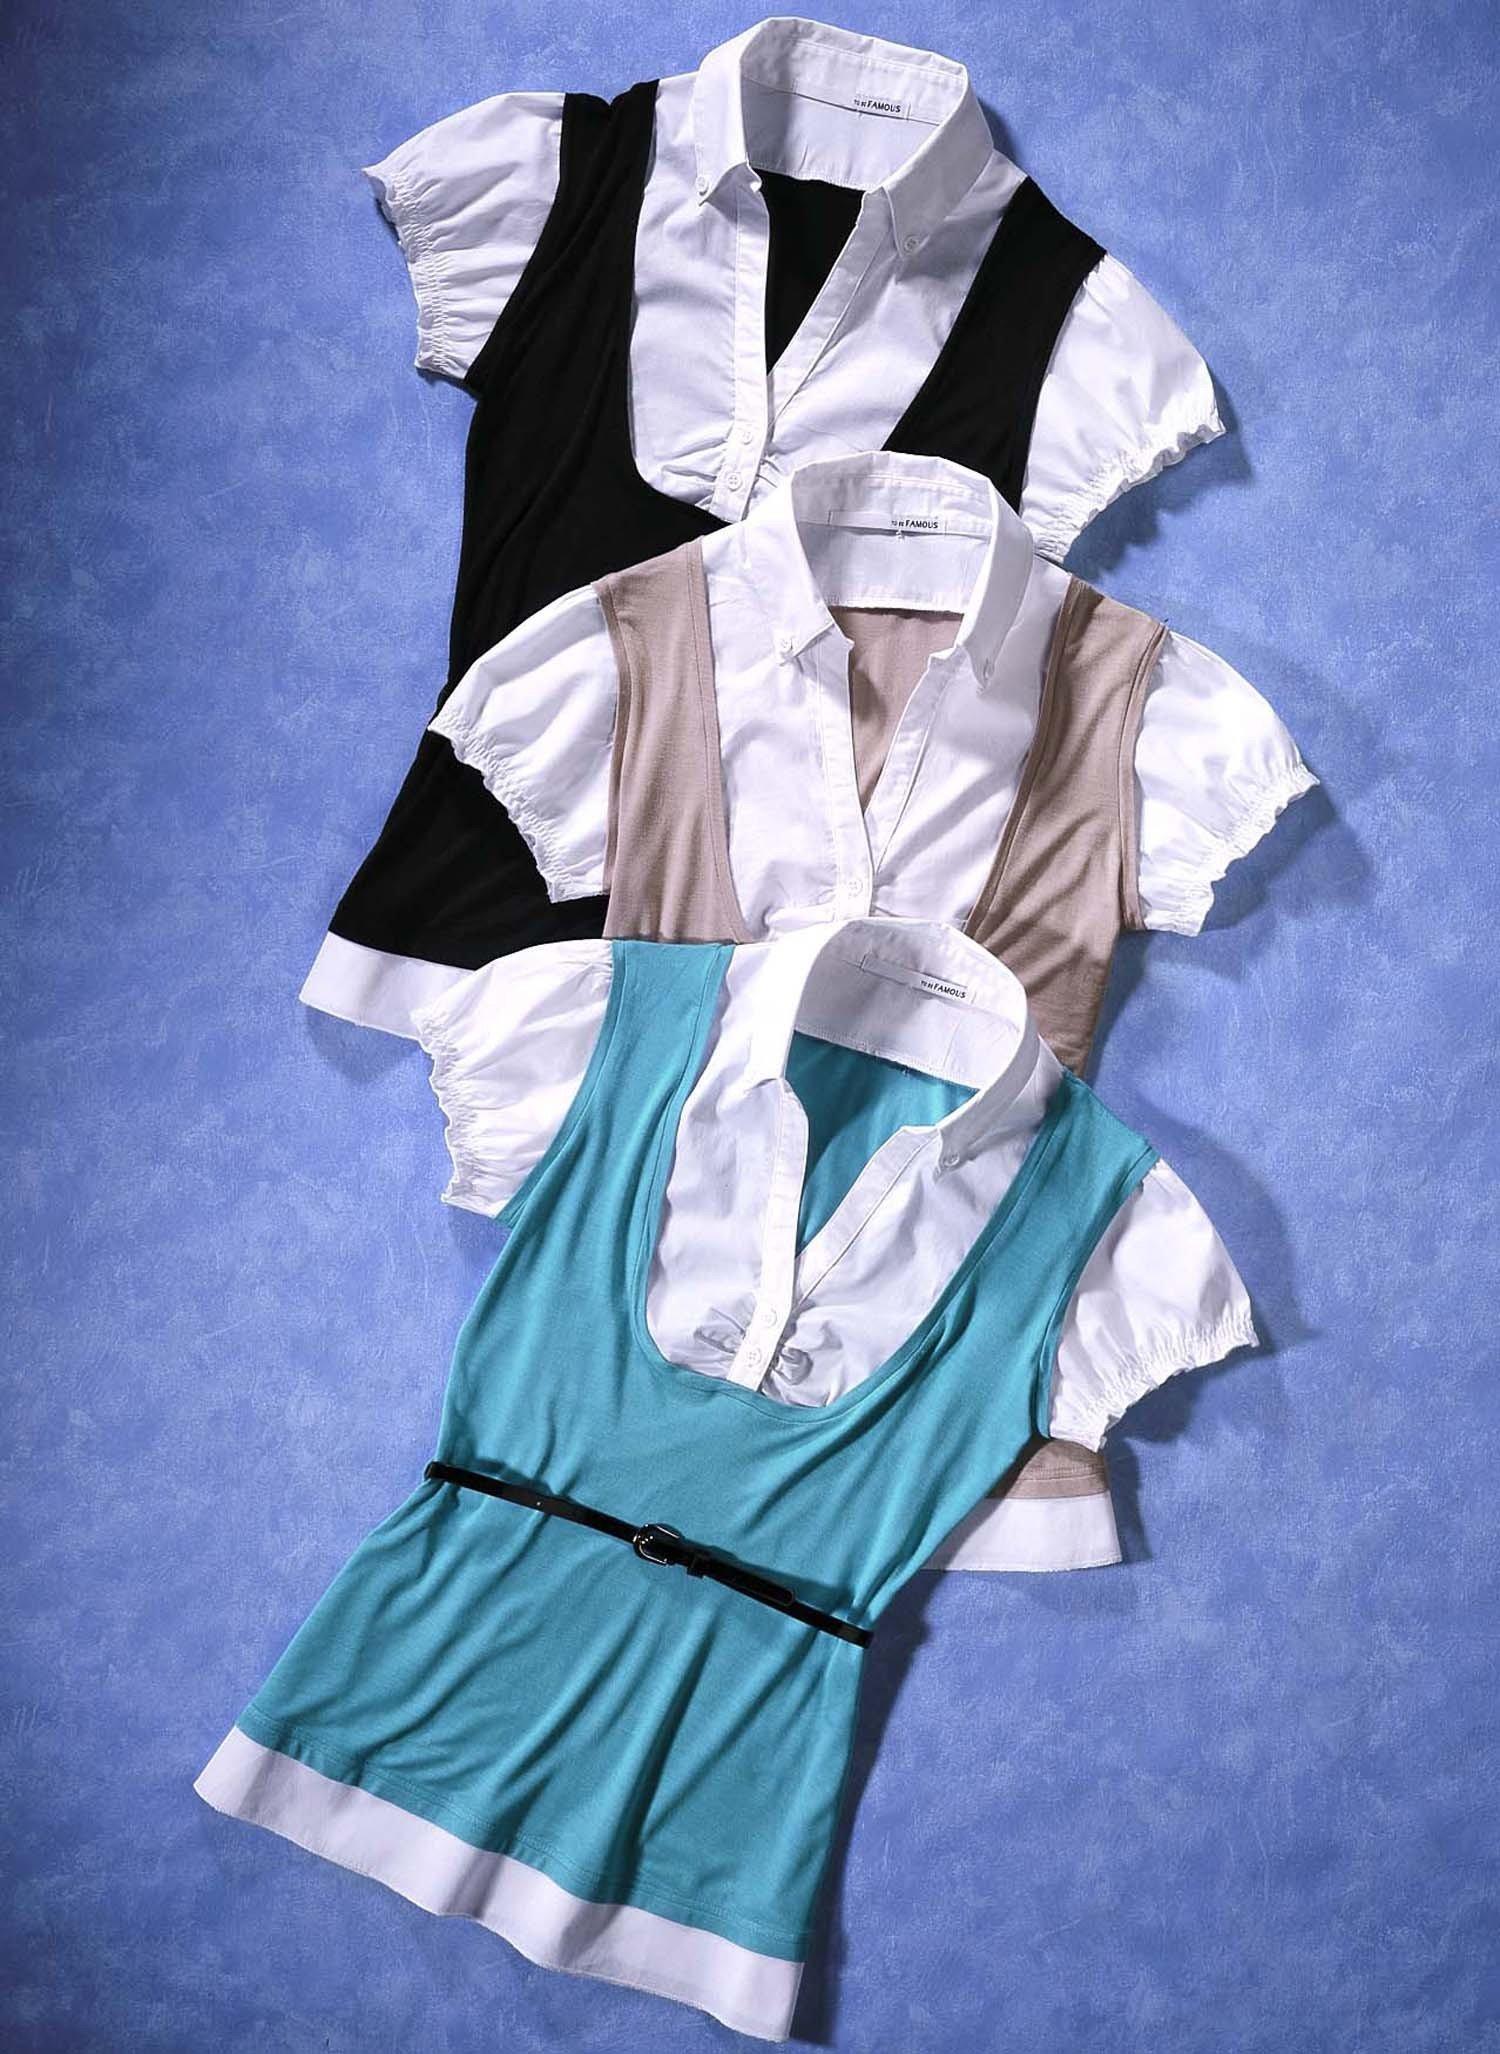 D-KA-Shirt-Bluse,Gurt schwarz L 010 - 2 - Ronja.ch